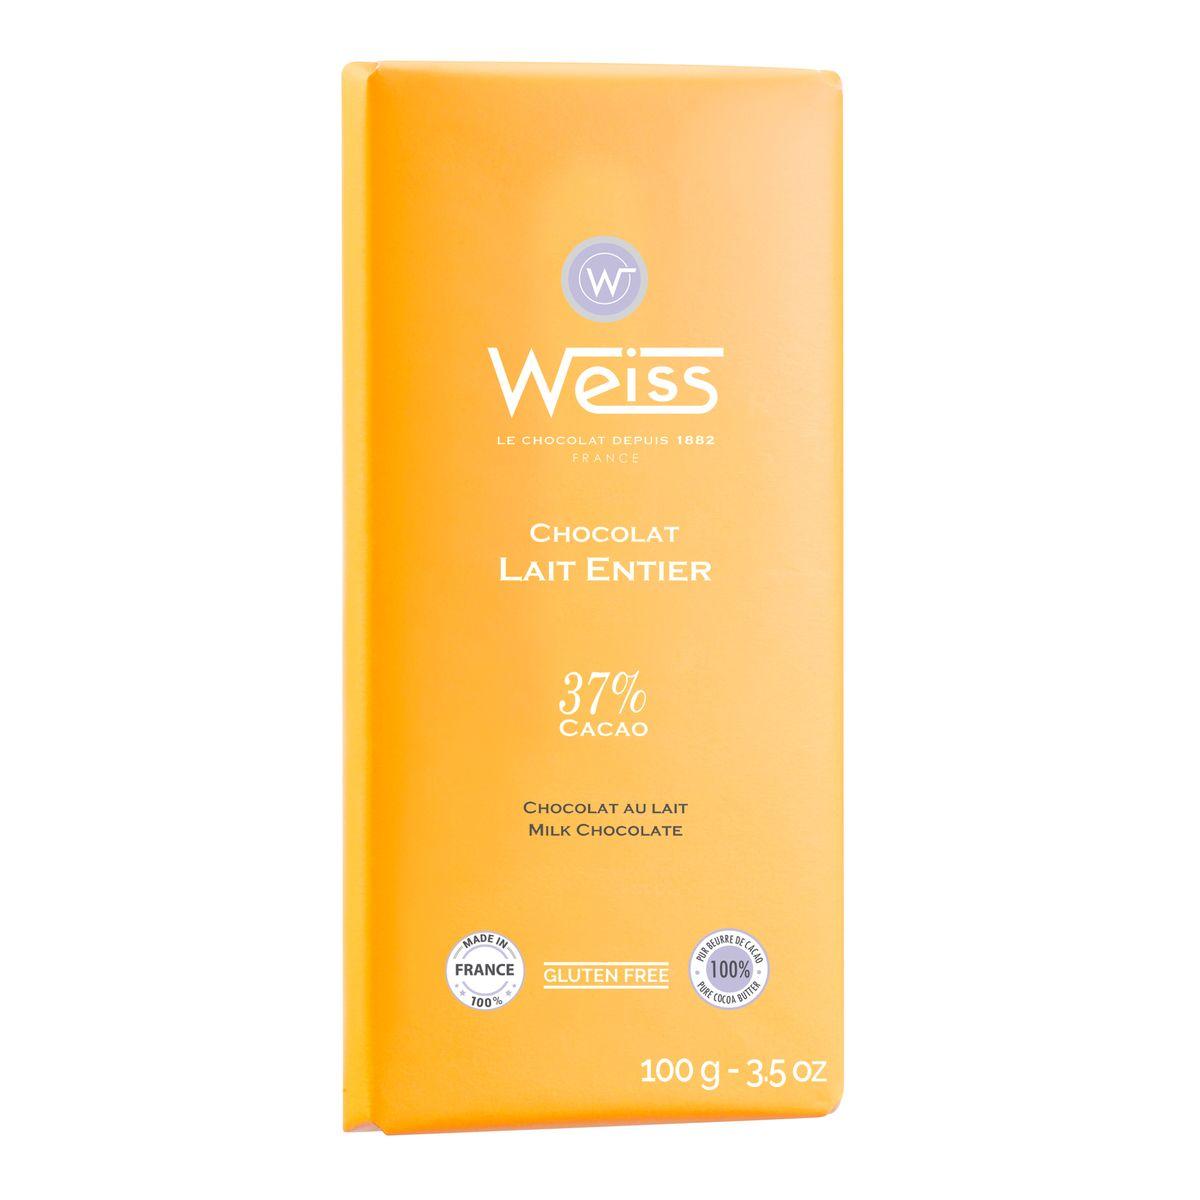 Tablette 100g lait entier 37% - Weiss